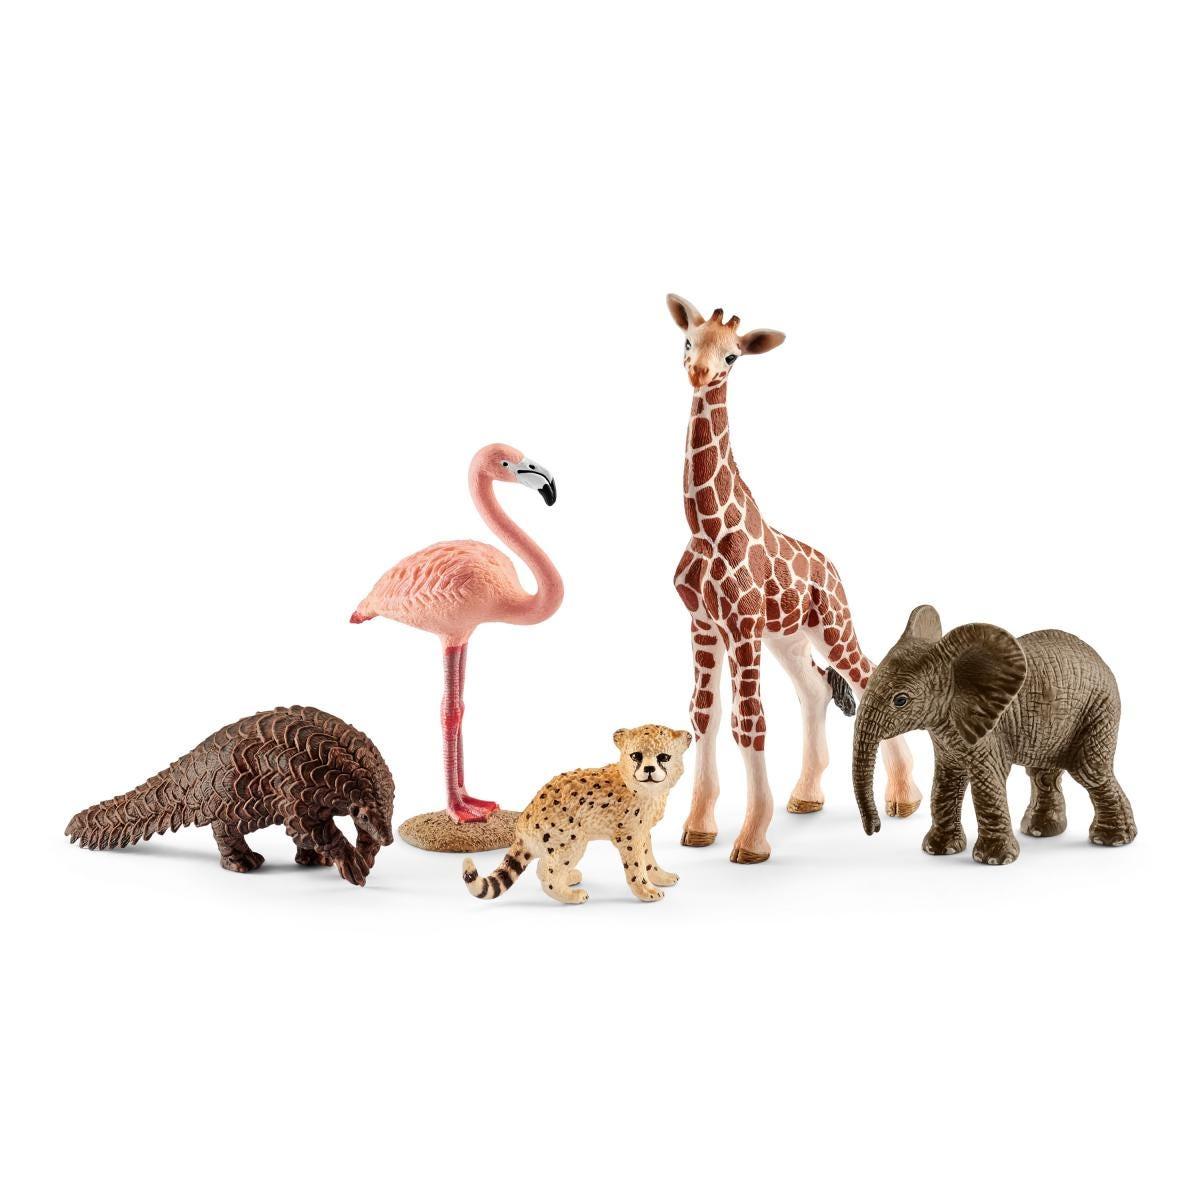 SCHLEICH 42387 Wild Life Starter Set includes 4 Animal Figurines Plastic Figures